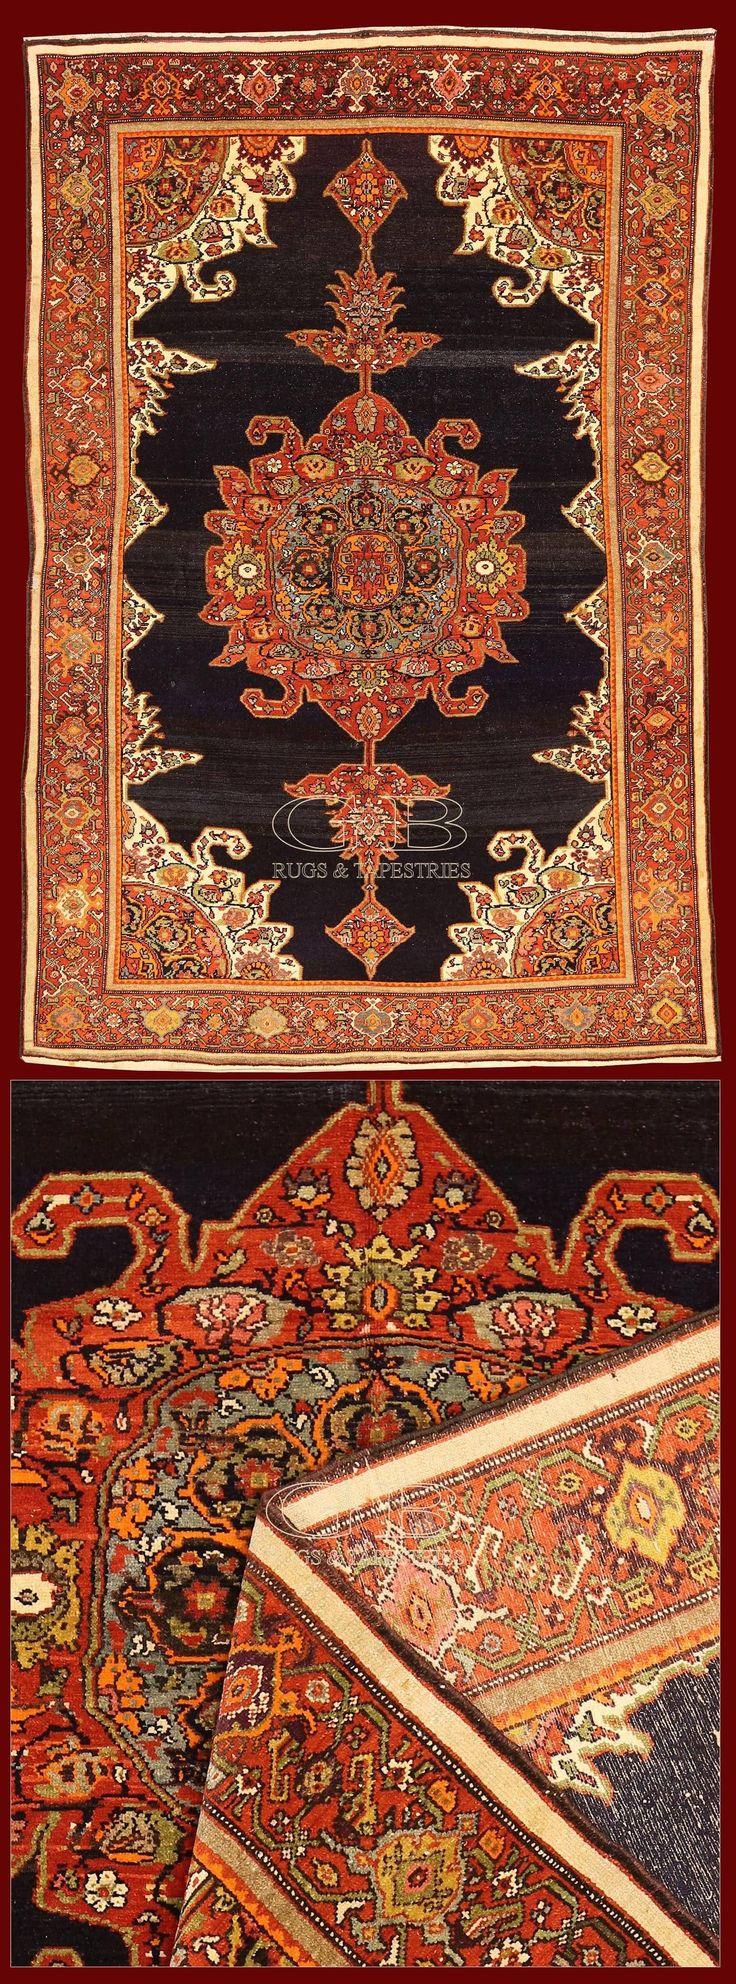 Antique Farahan Sarouk Iran Magnificent Persian Rugs Turks Carpets Of Xixth Cent